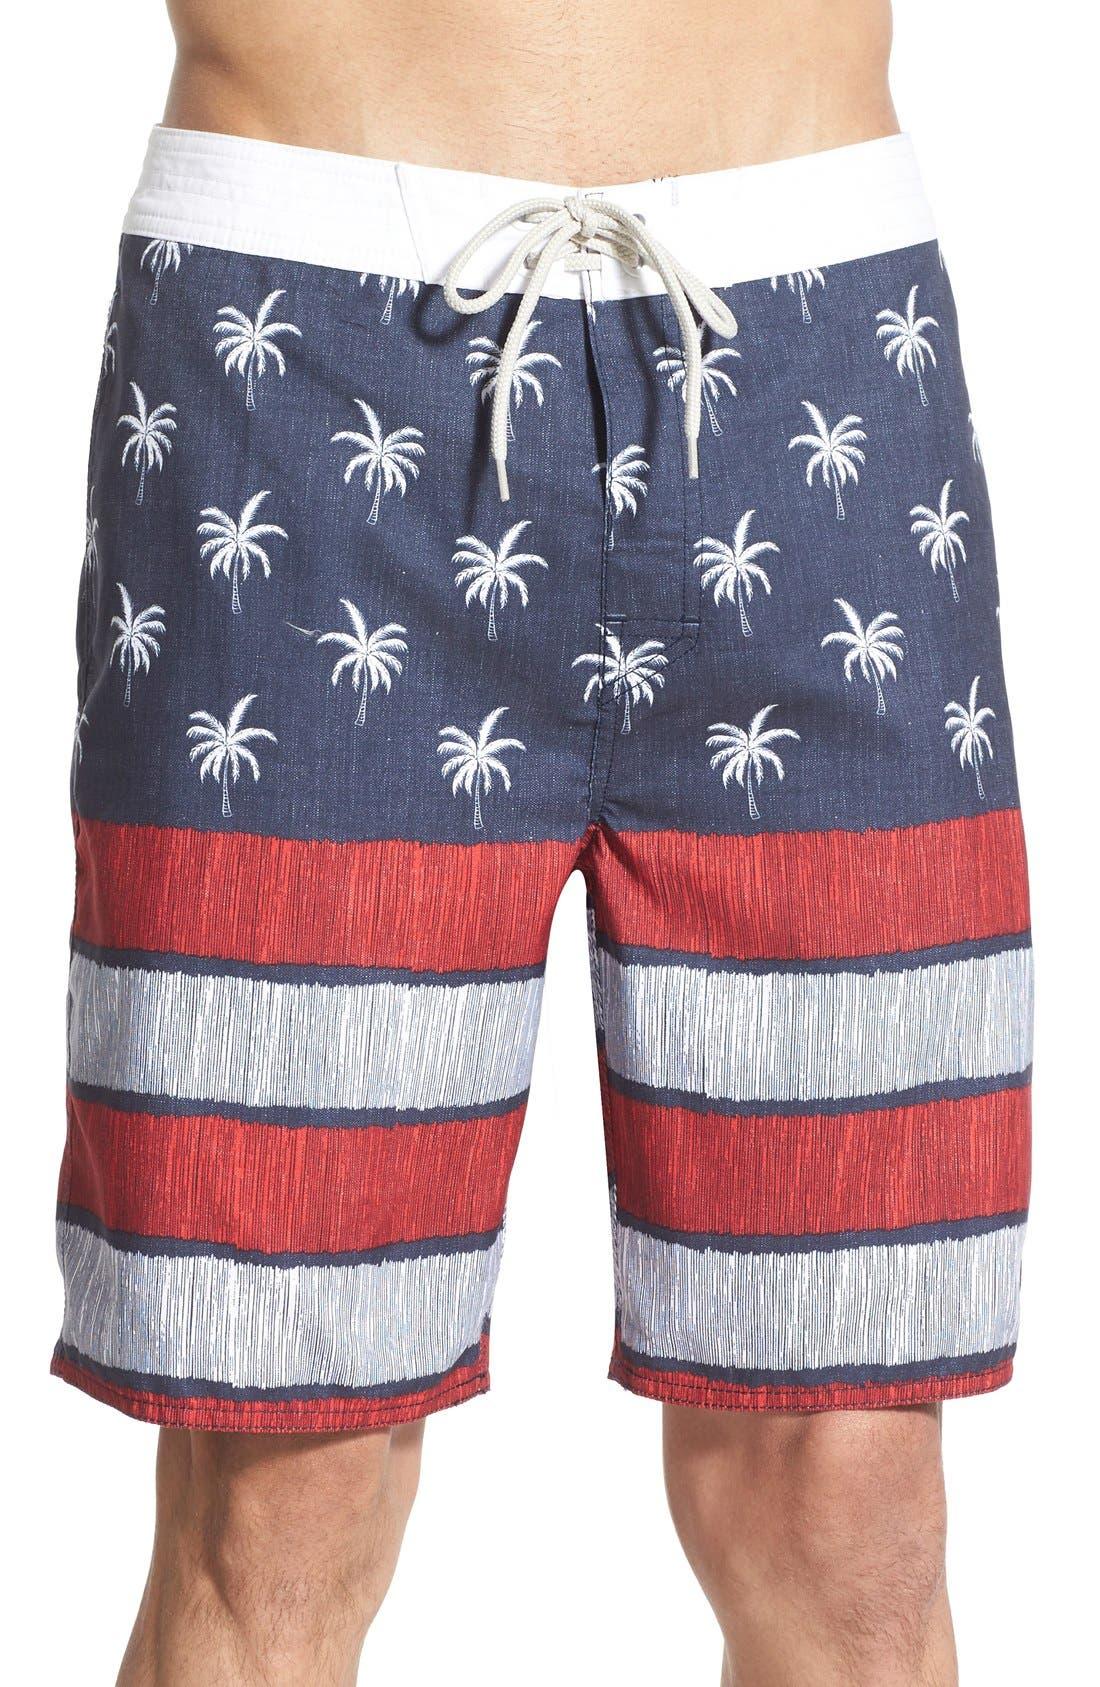 Main Image - Rip Curl 'Independence' Board Shorts